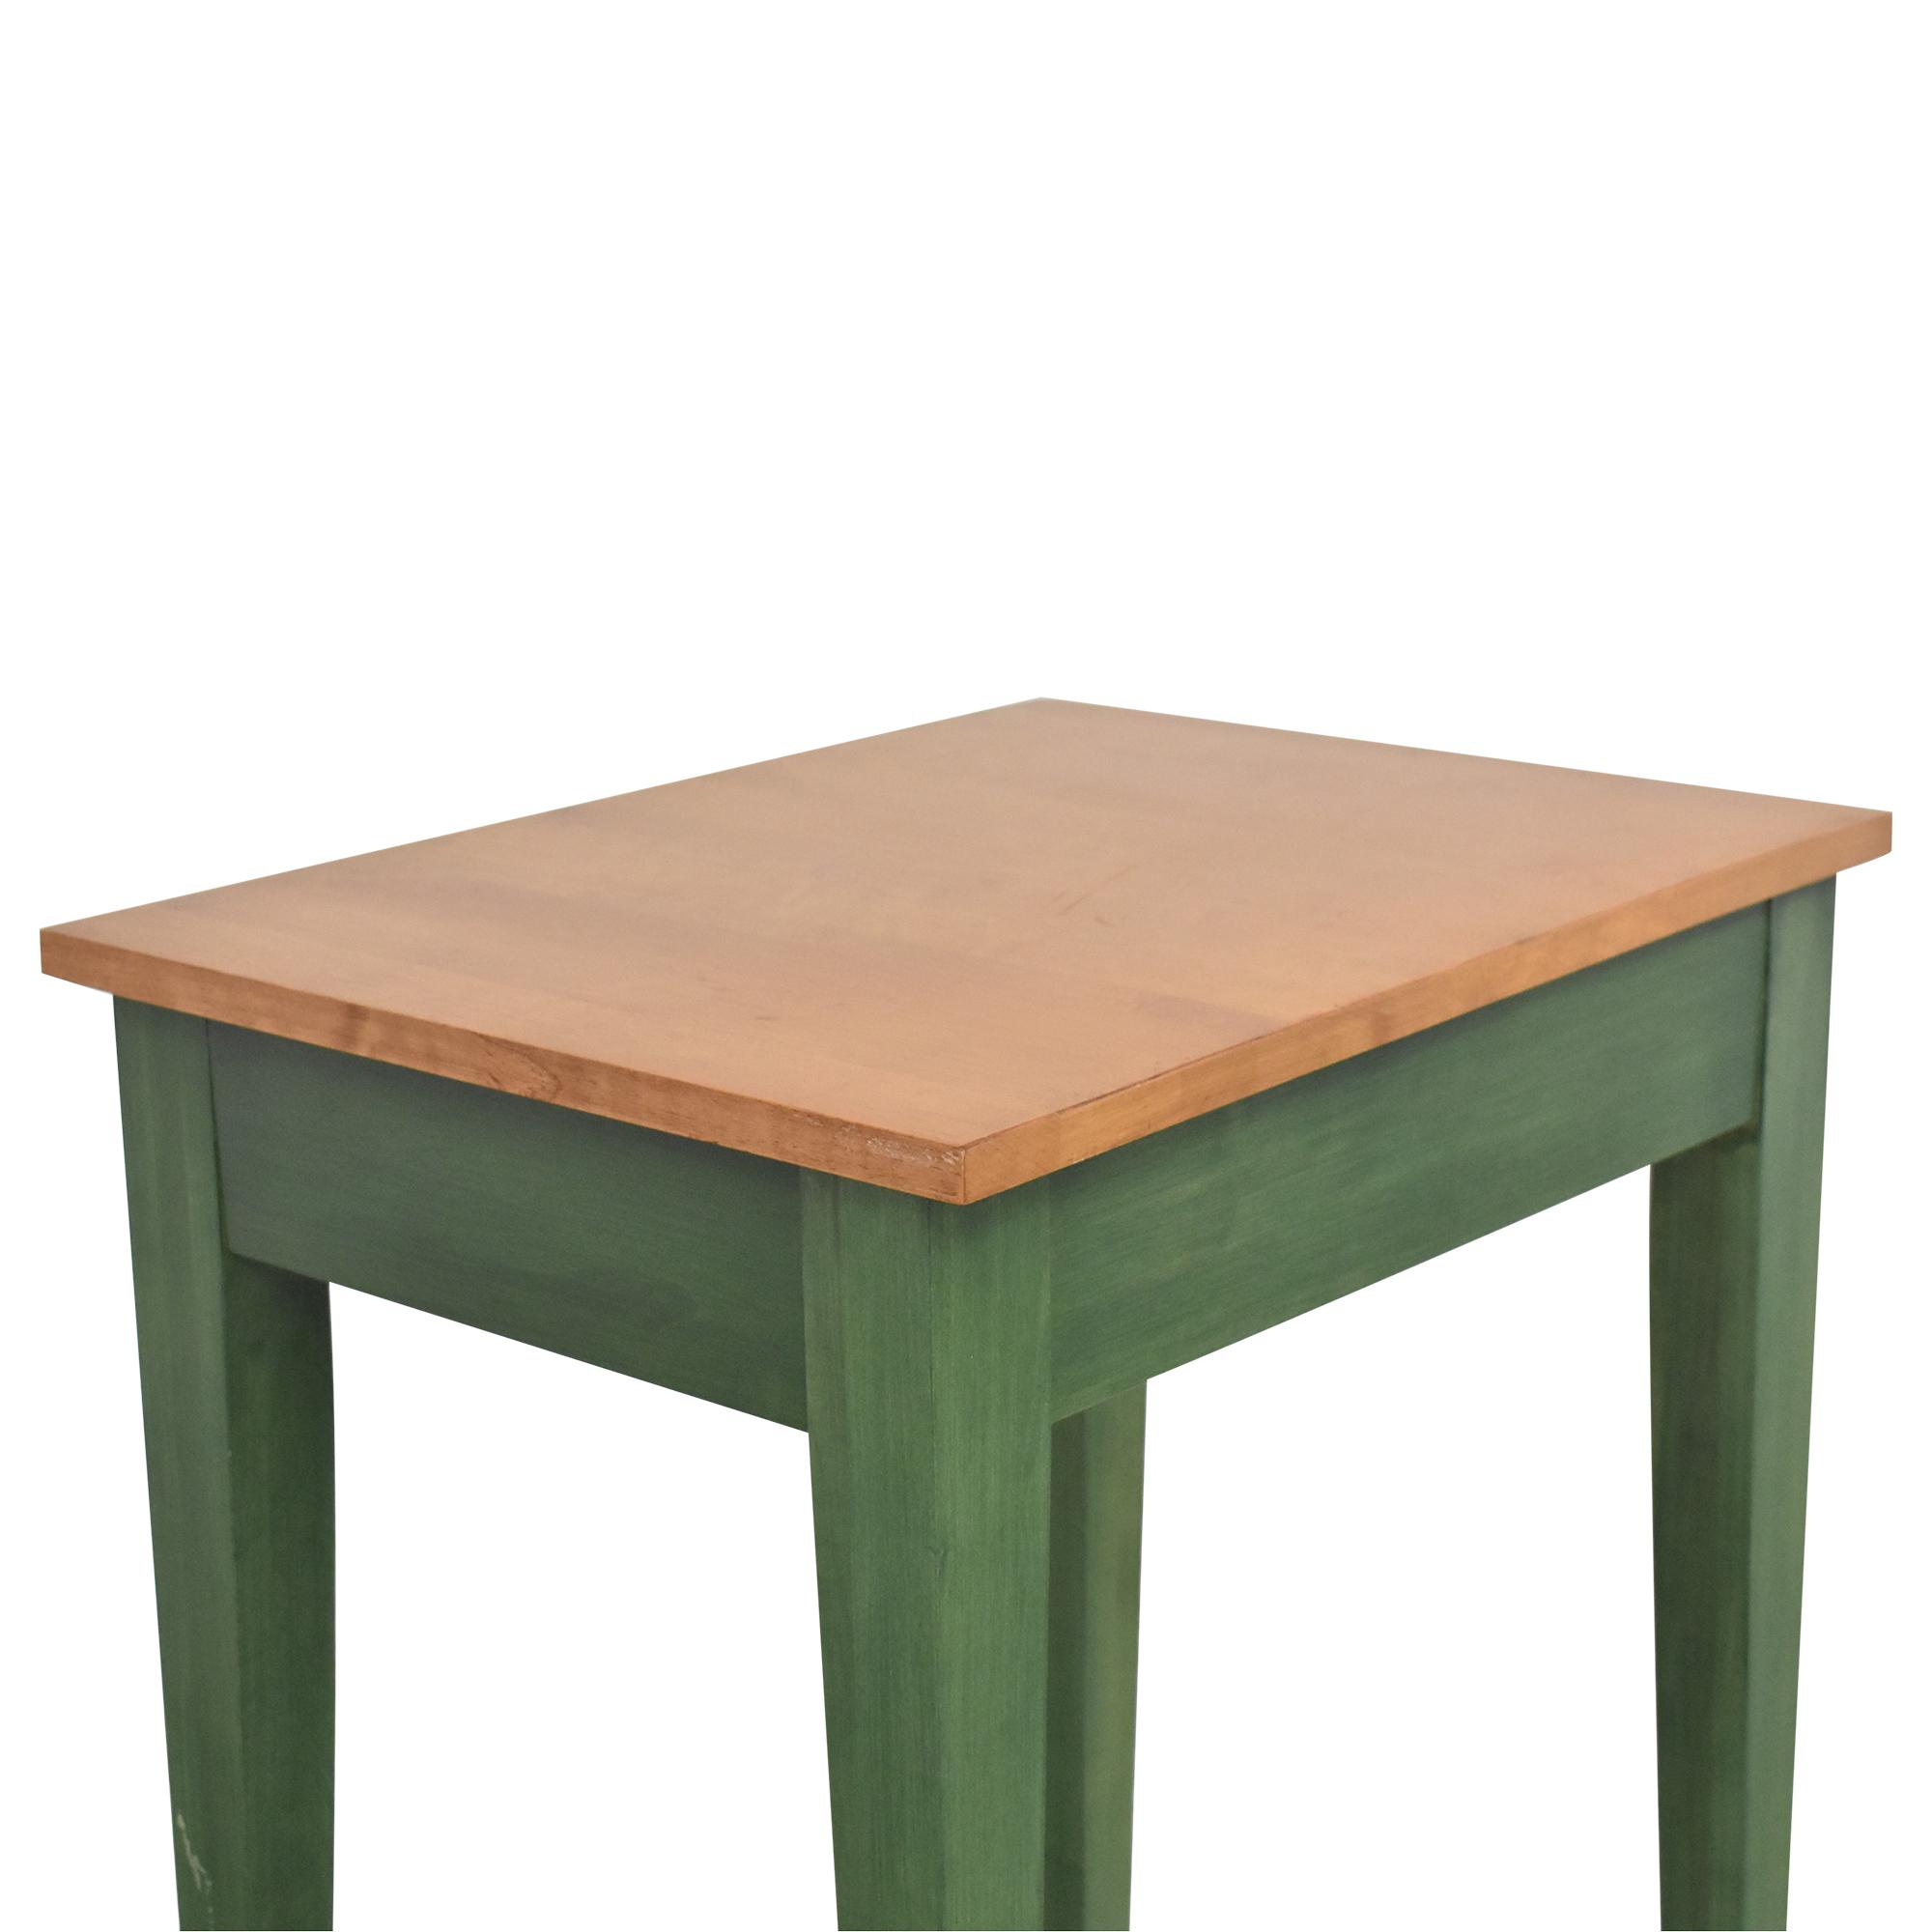 Ethan Allen Ethan Allen High Top Table discount